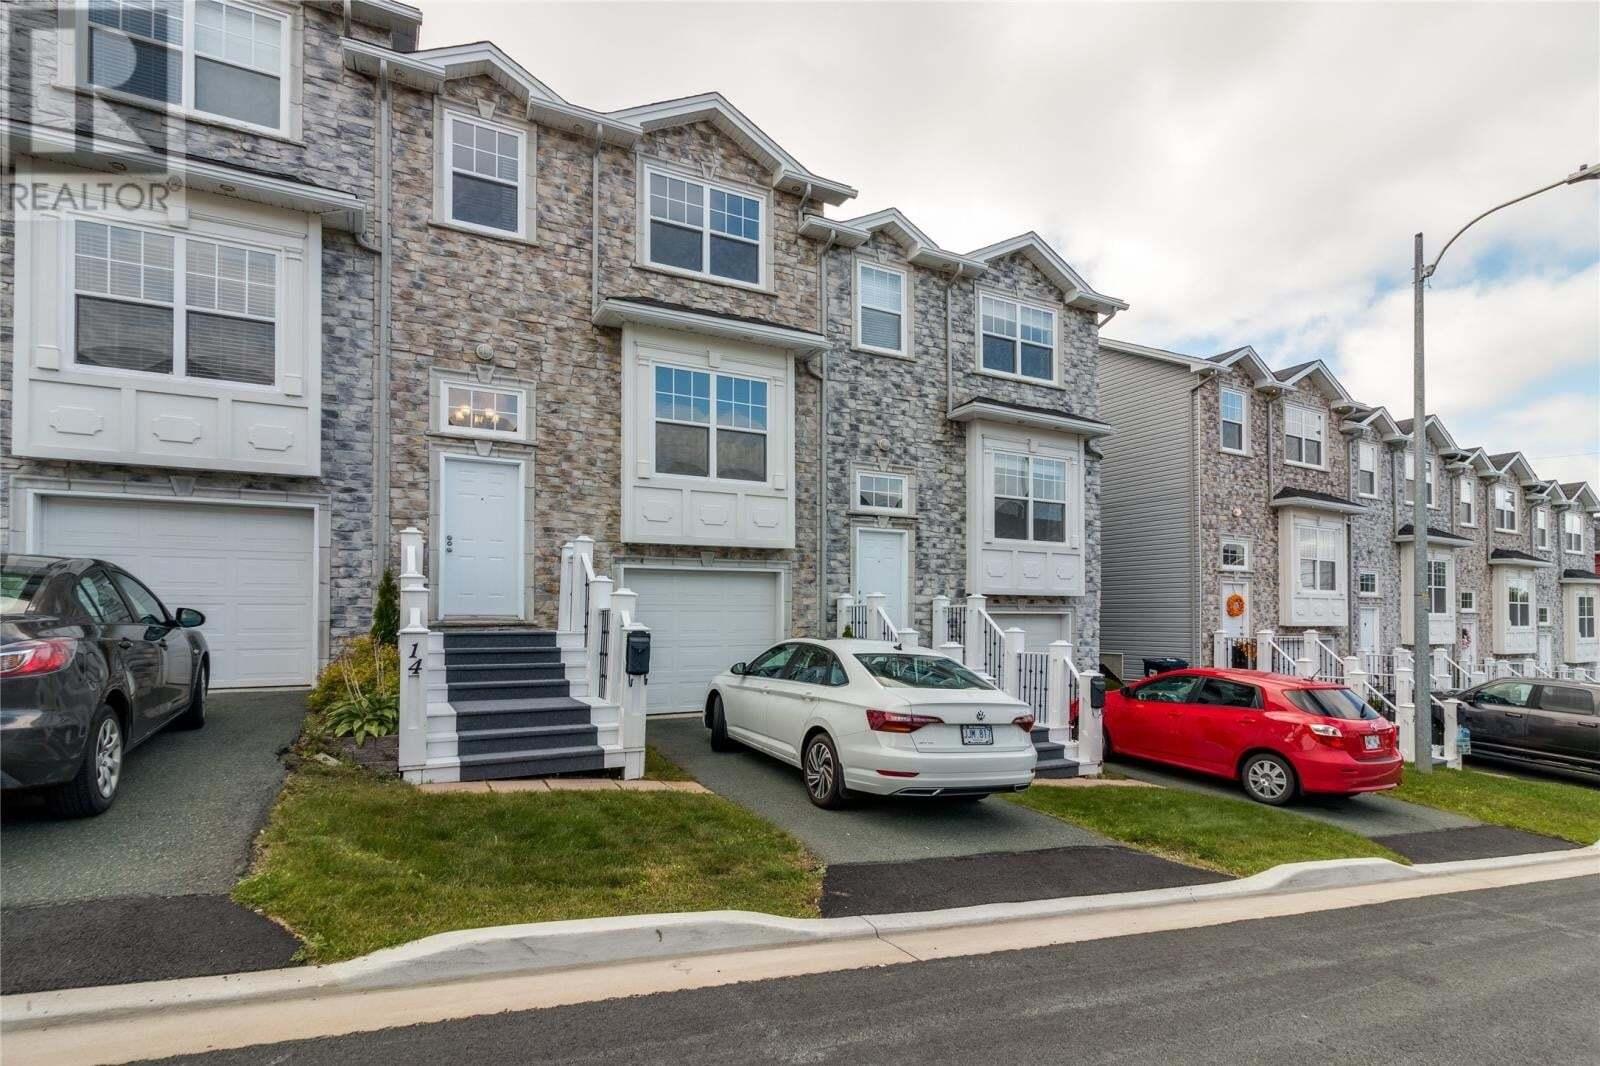 House for sale at 14 King Edward Pl St. John's Newfoundland - MLS: 1222633